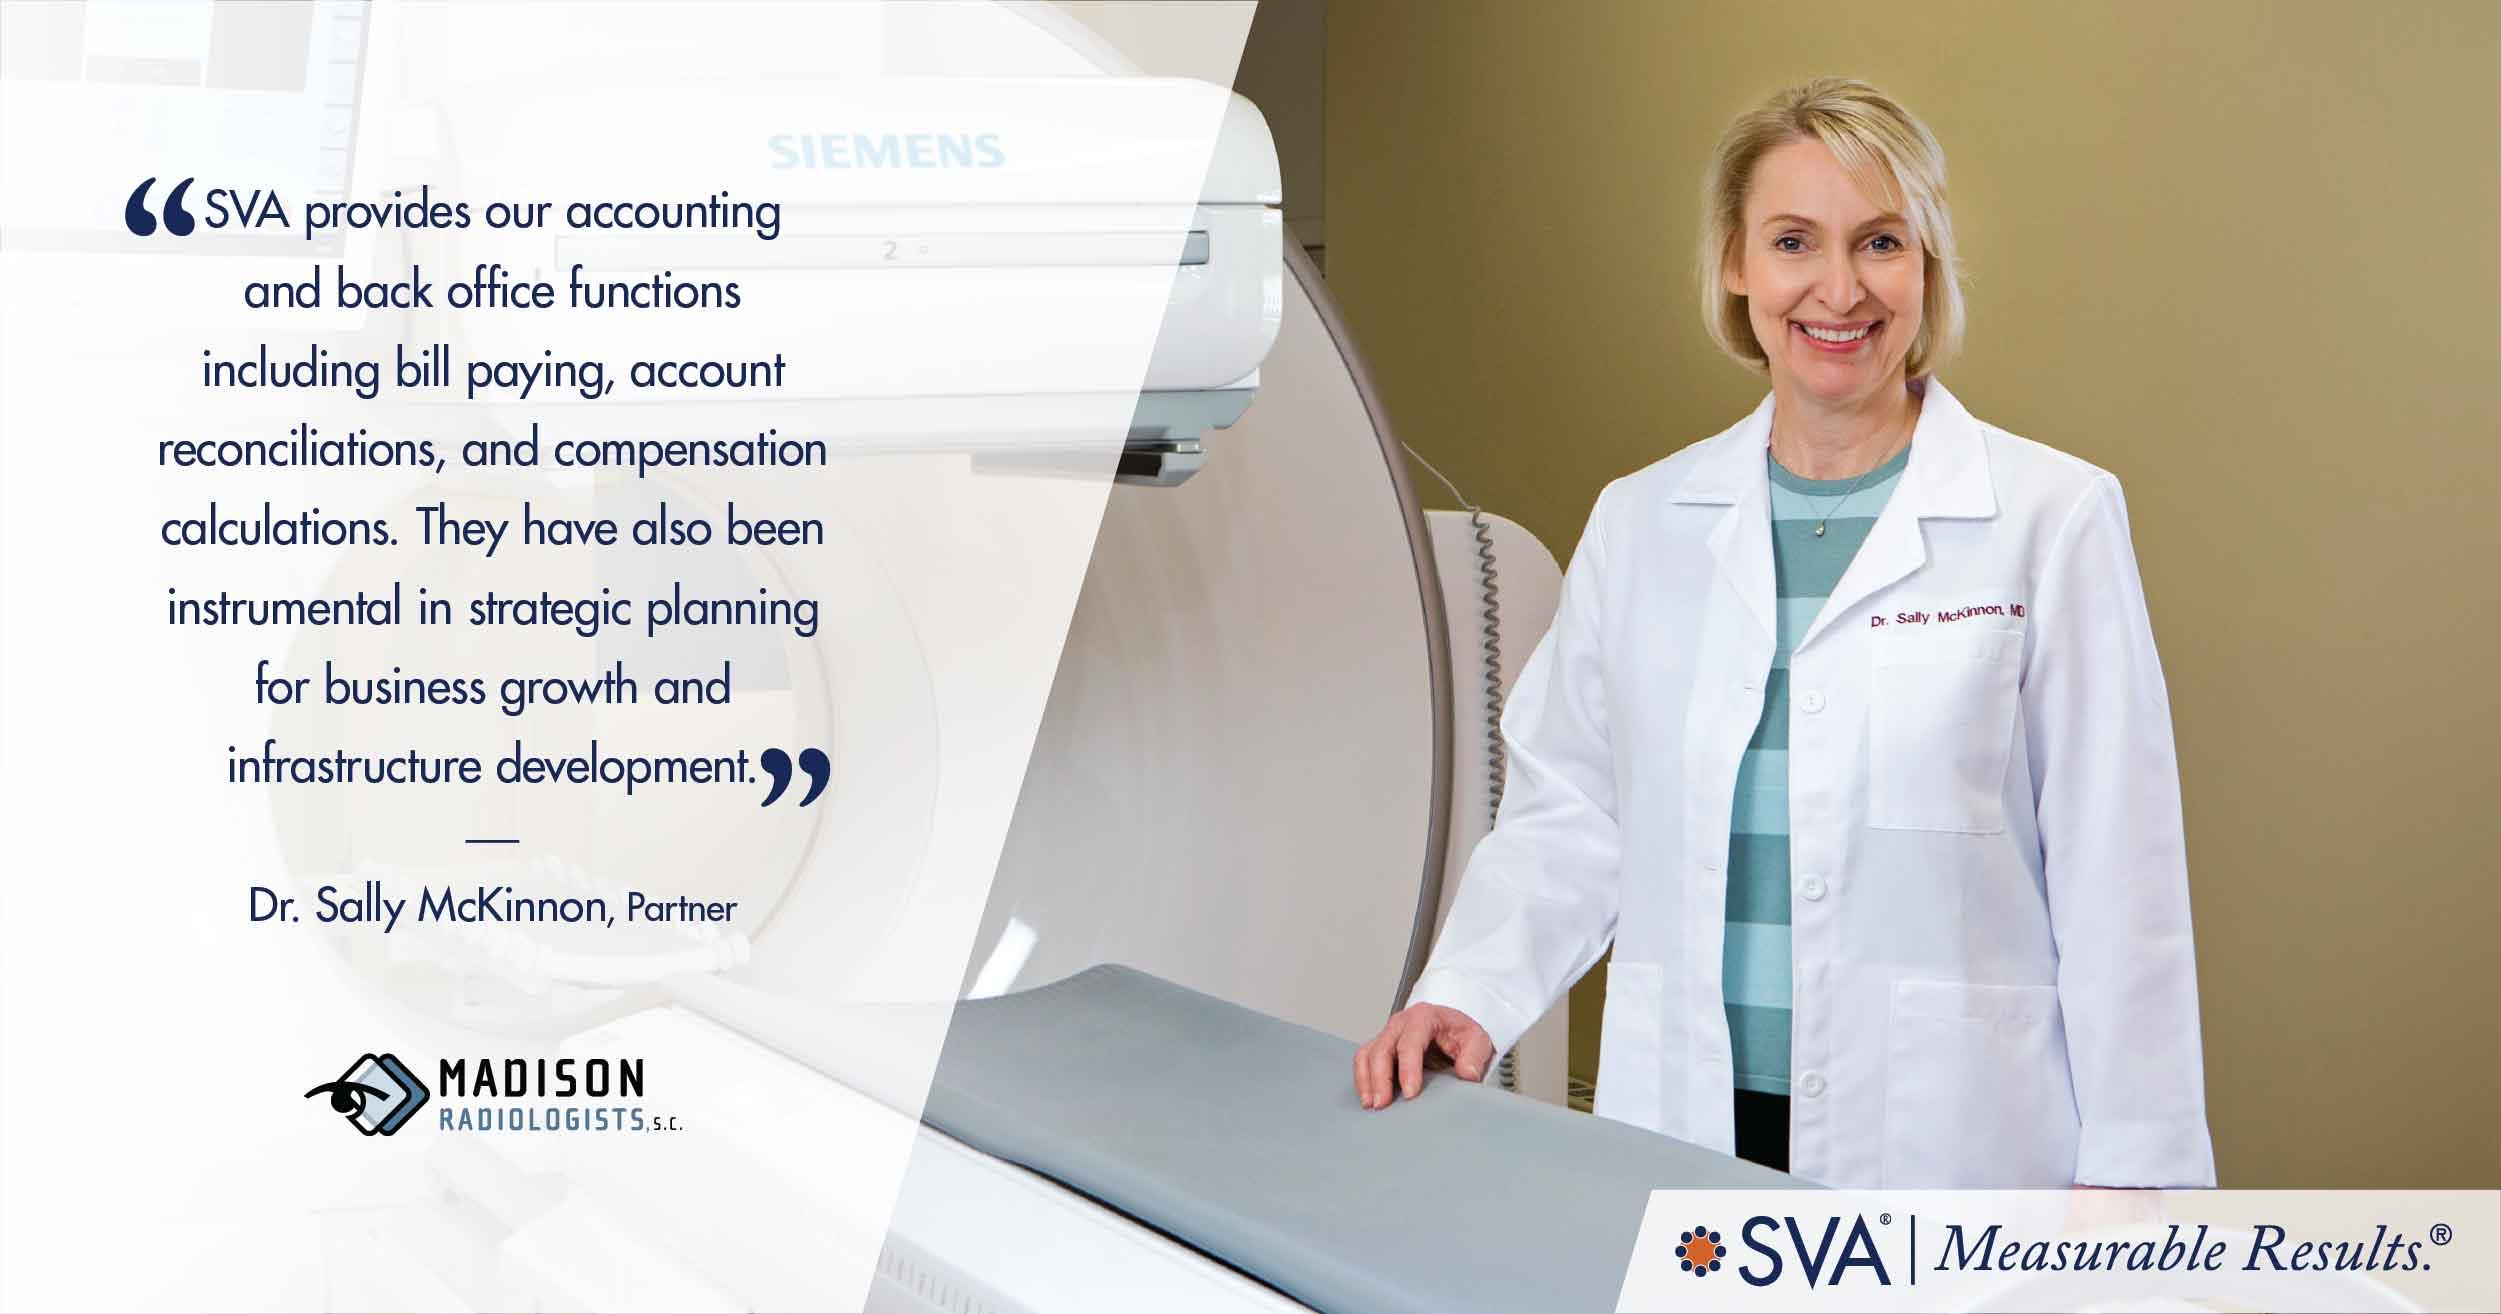 Madison Radiologists